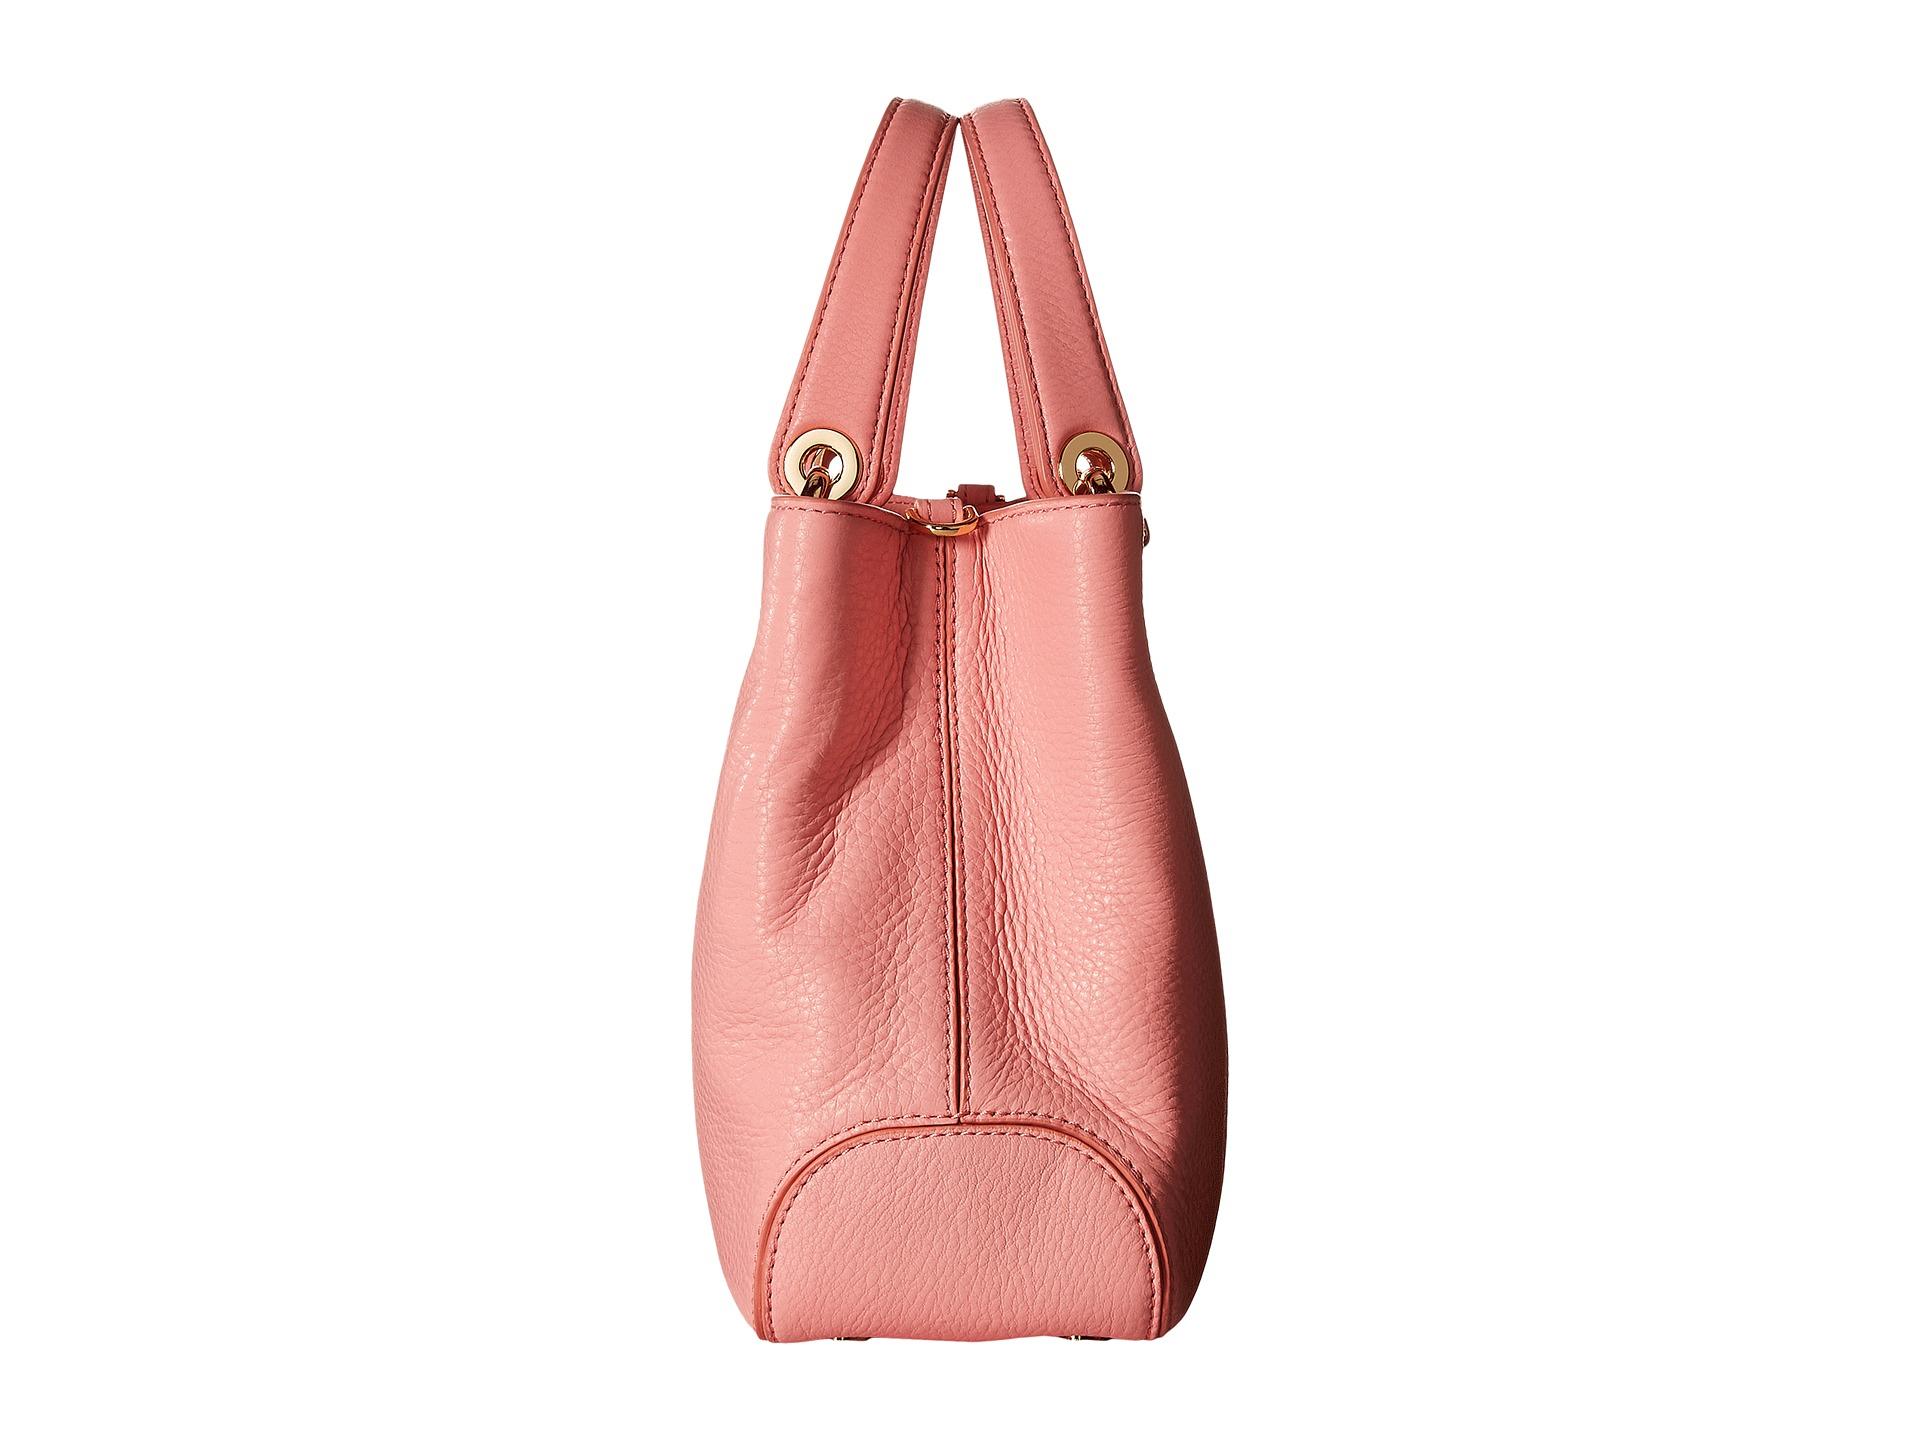 fbb37725724c Lyst - MICHAEL Michael Kors Jet Set Snap Pocket Leather Tote Bag in Pink